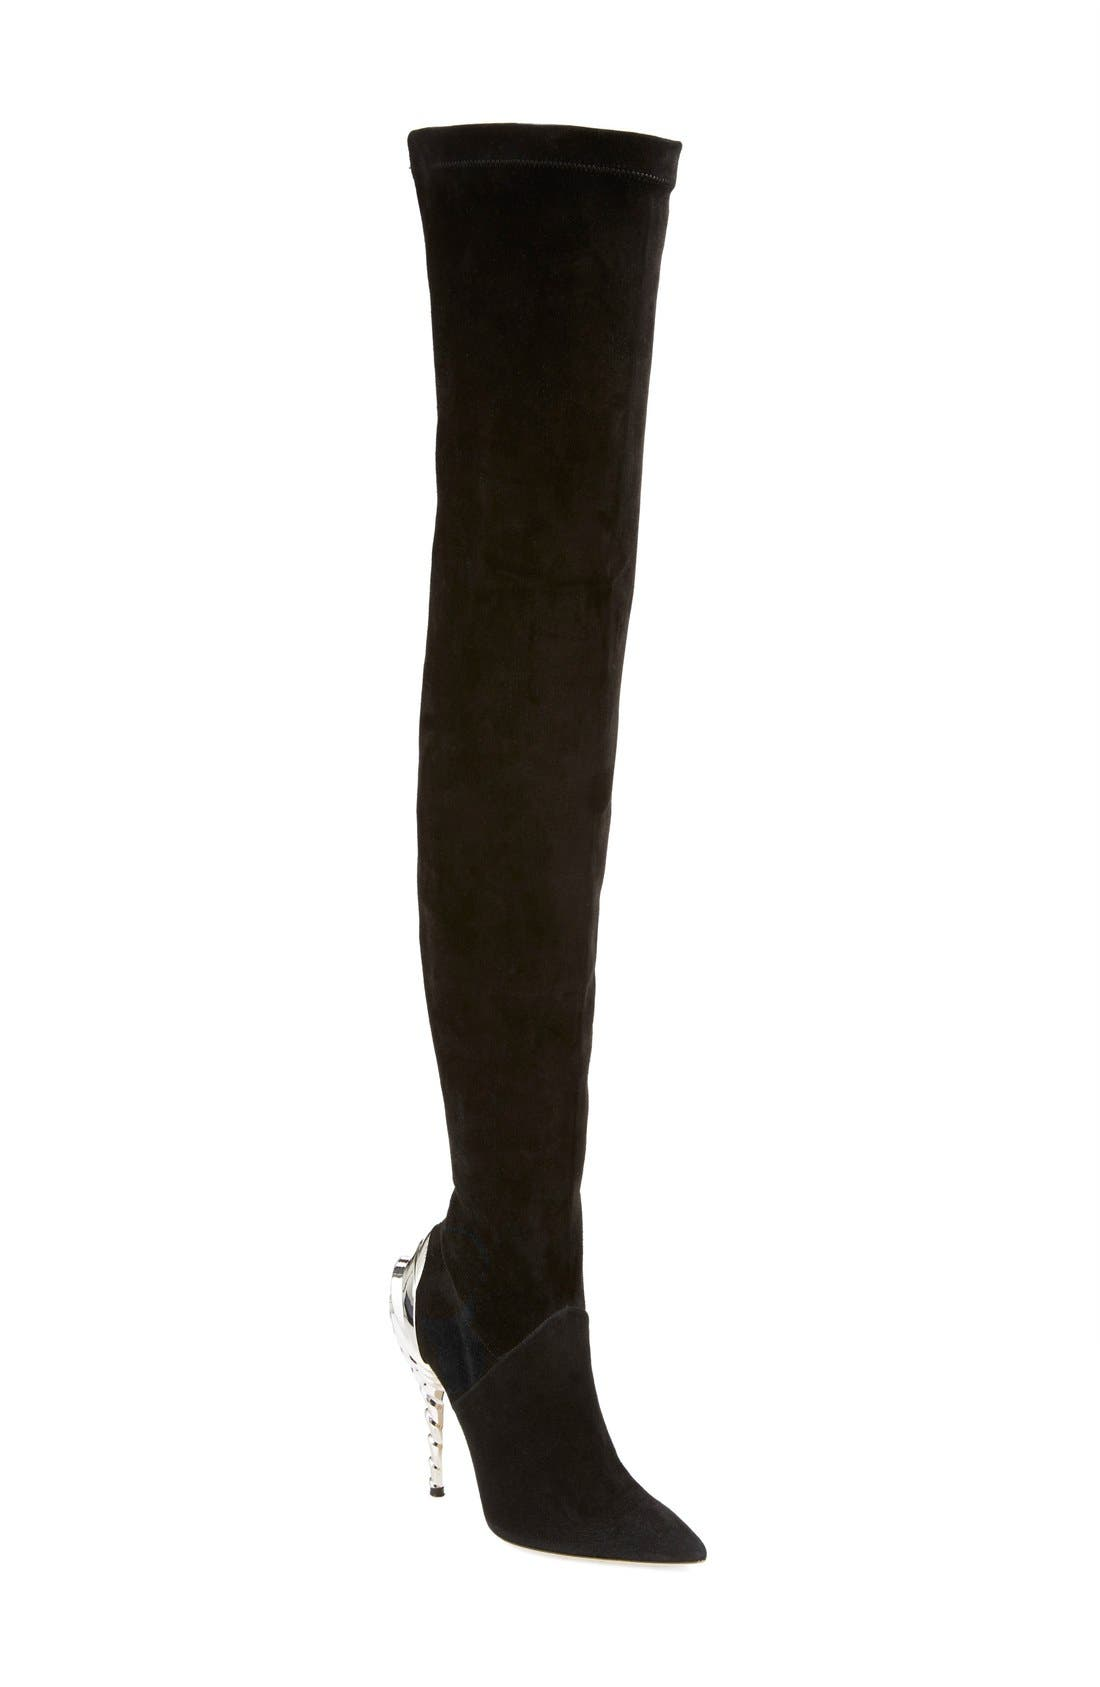 Alternate Image 1 Selected - Paul Andrew 'Chrysler' Thigh High Boot (Women) (Narrow Calf)